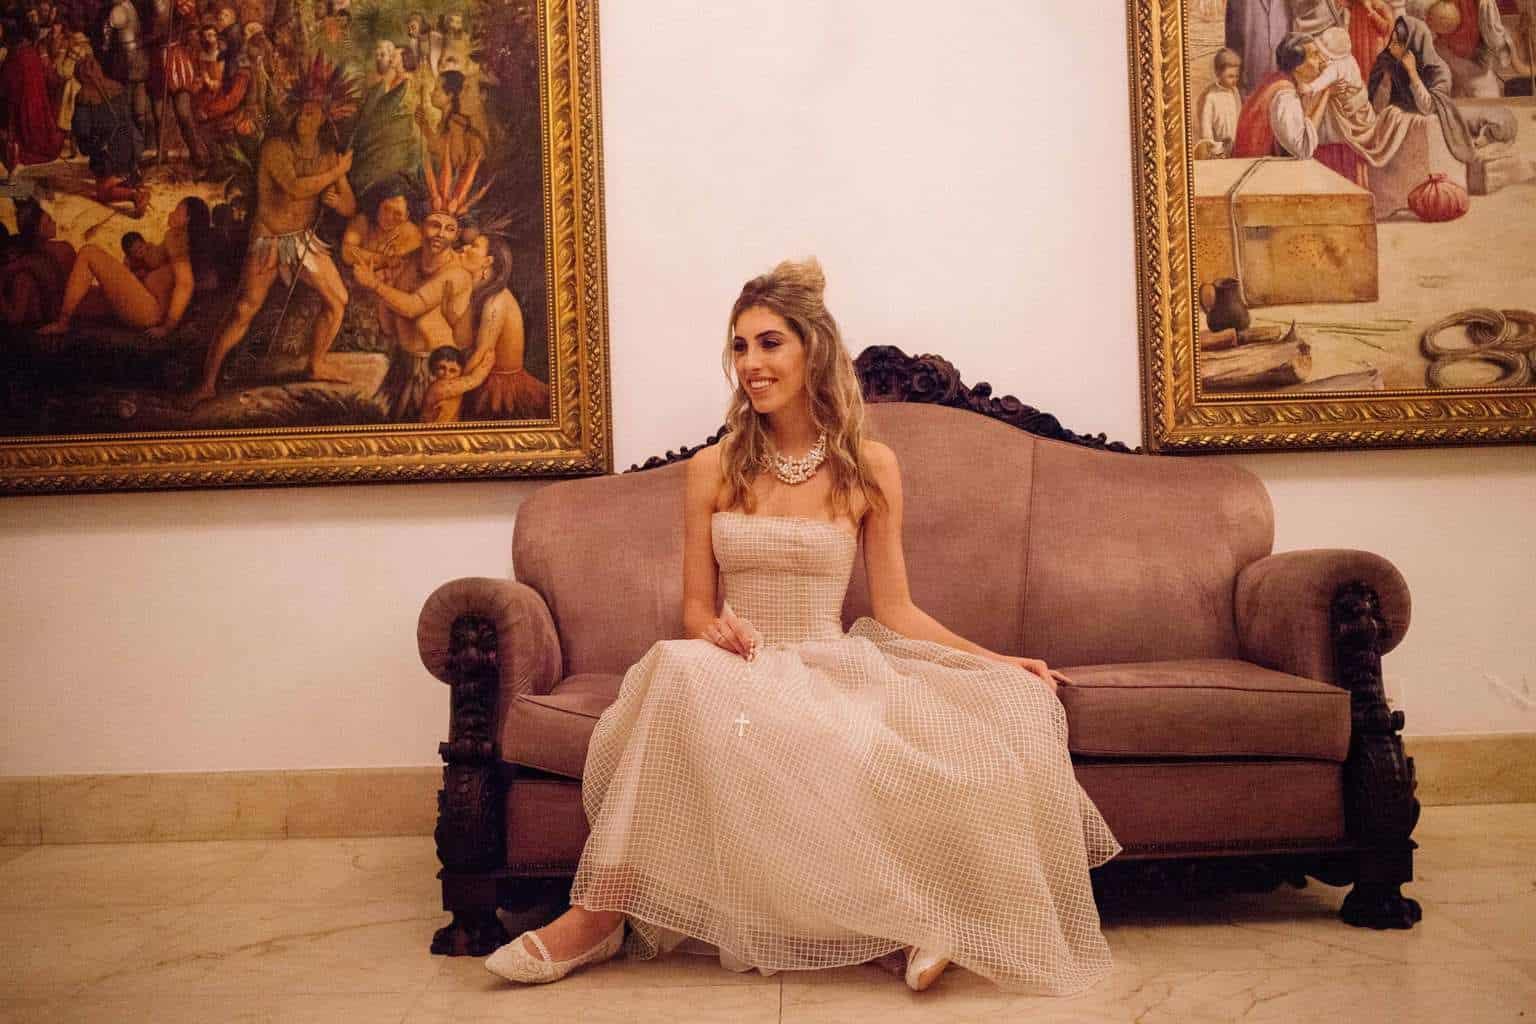 casamento-casamento-de-dia-cerimonia-Cissa-Sannomiya-Clube-Hipico-de-Santo-Amaro-igreja-marina-e-josé-Miguel-Kanashiro-casamento-2